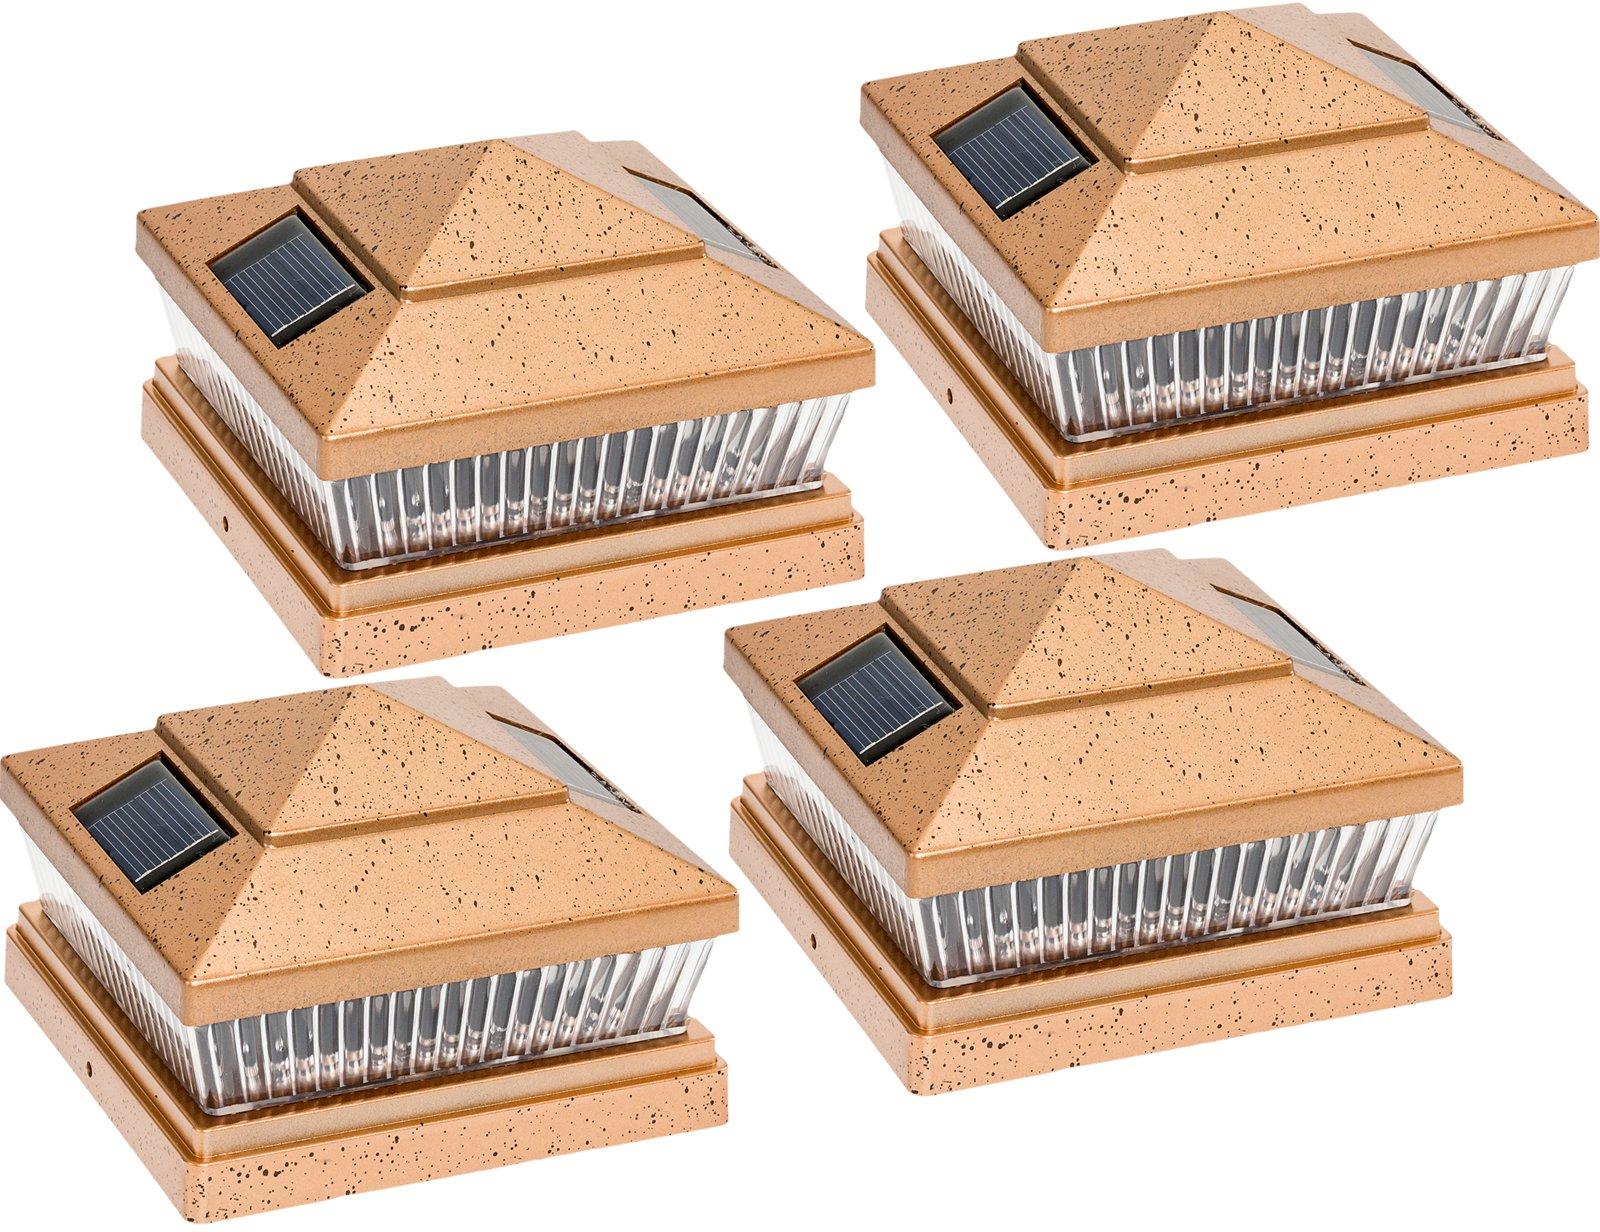 Garden Sun Light Solar 5 LED Post Cap Light for 6'' x 6'' PVC Posts w/ 5'' x 5'' Adapter 4-Pack by Garden Sun Light